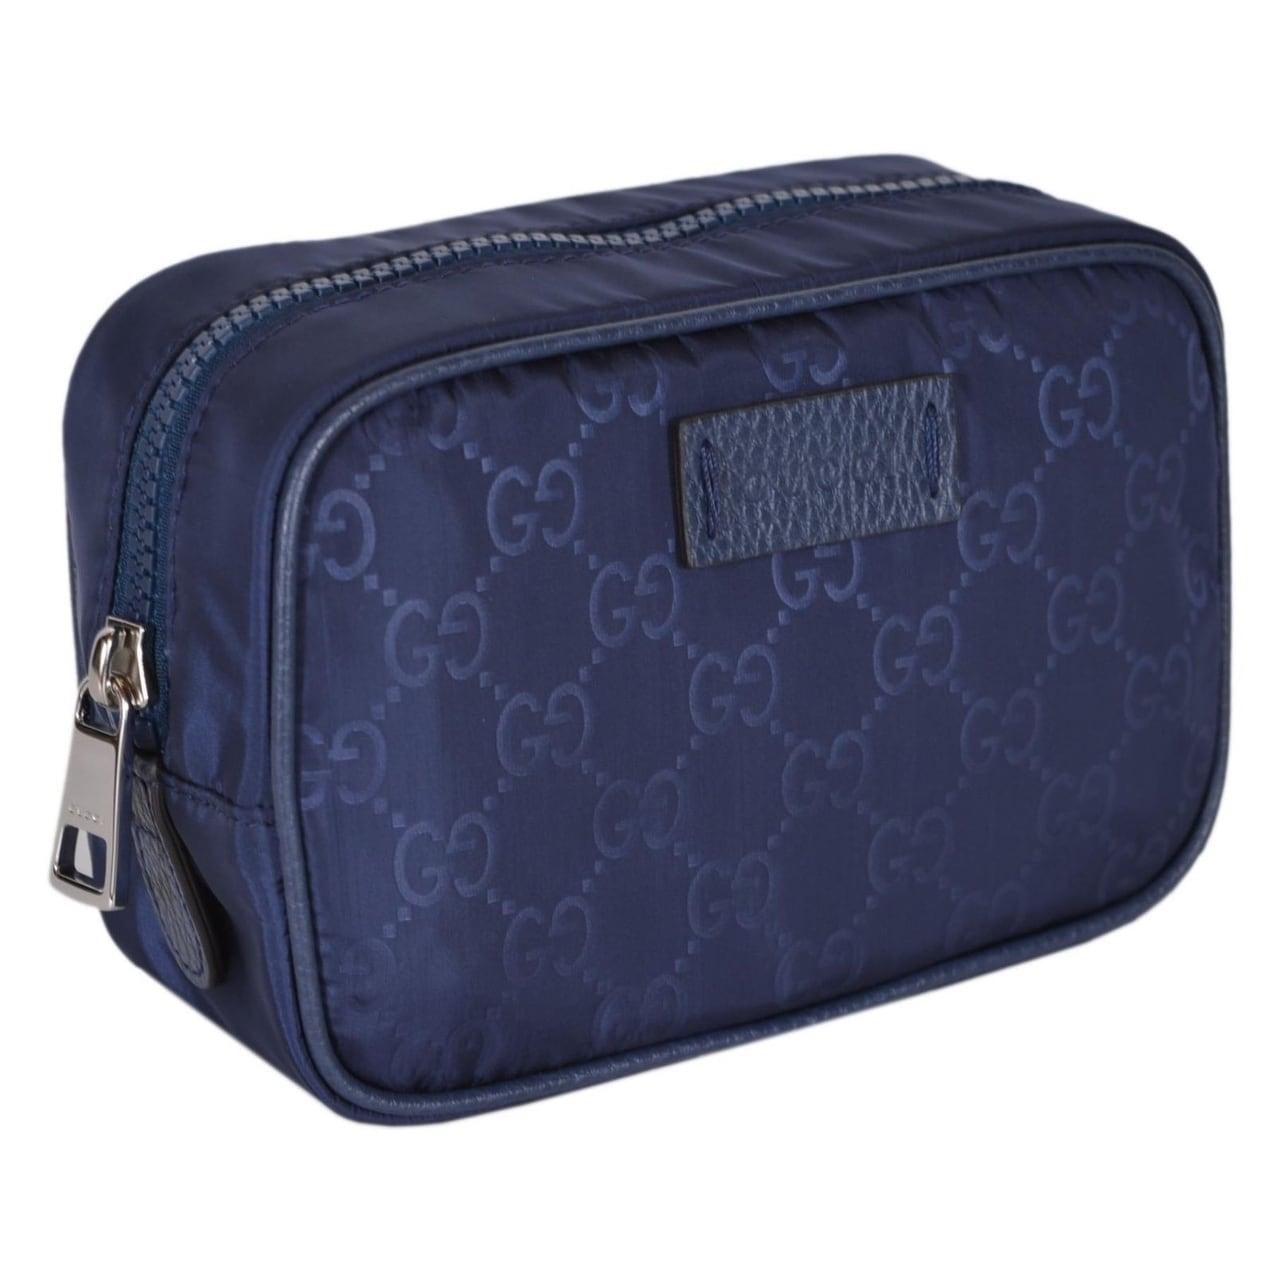 a4c675bee5bc2 Gucci blue nylon guccissima small toiletry cosmetic dopp bag jpg 1275x1275 Gucci  toiletry pouch